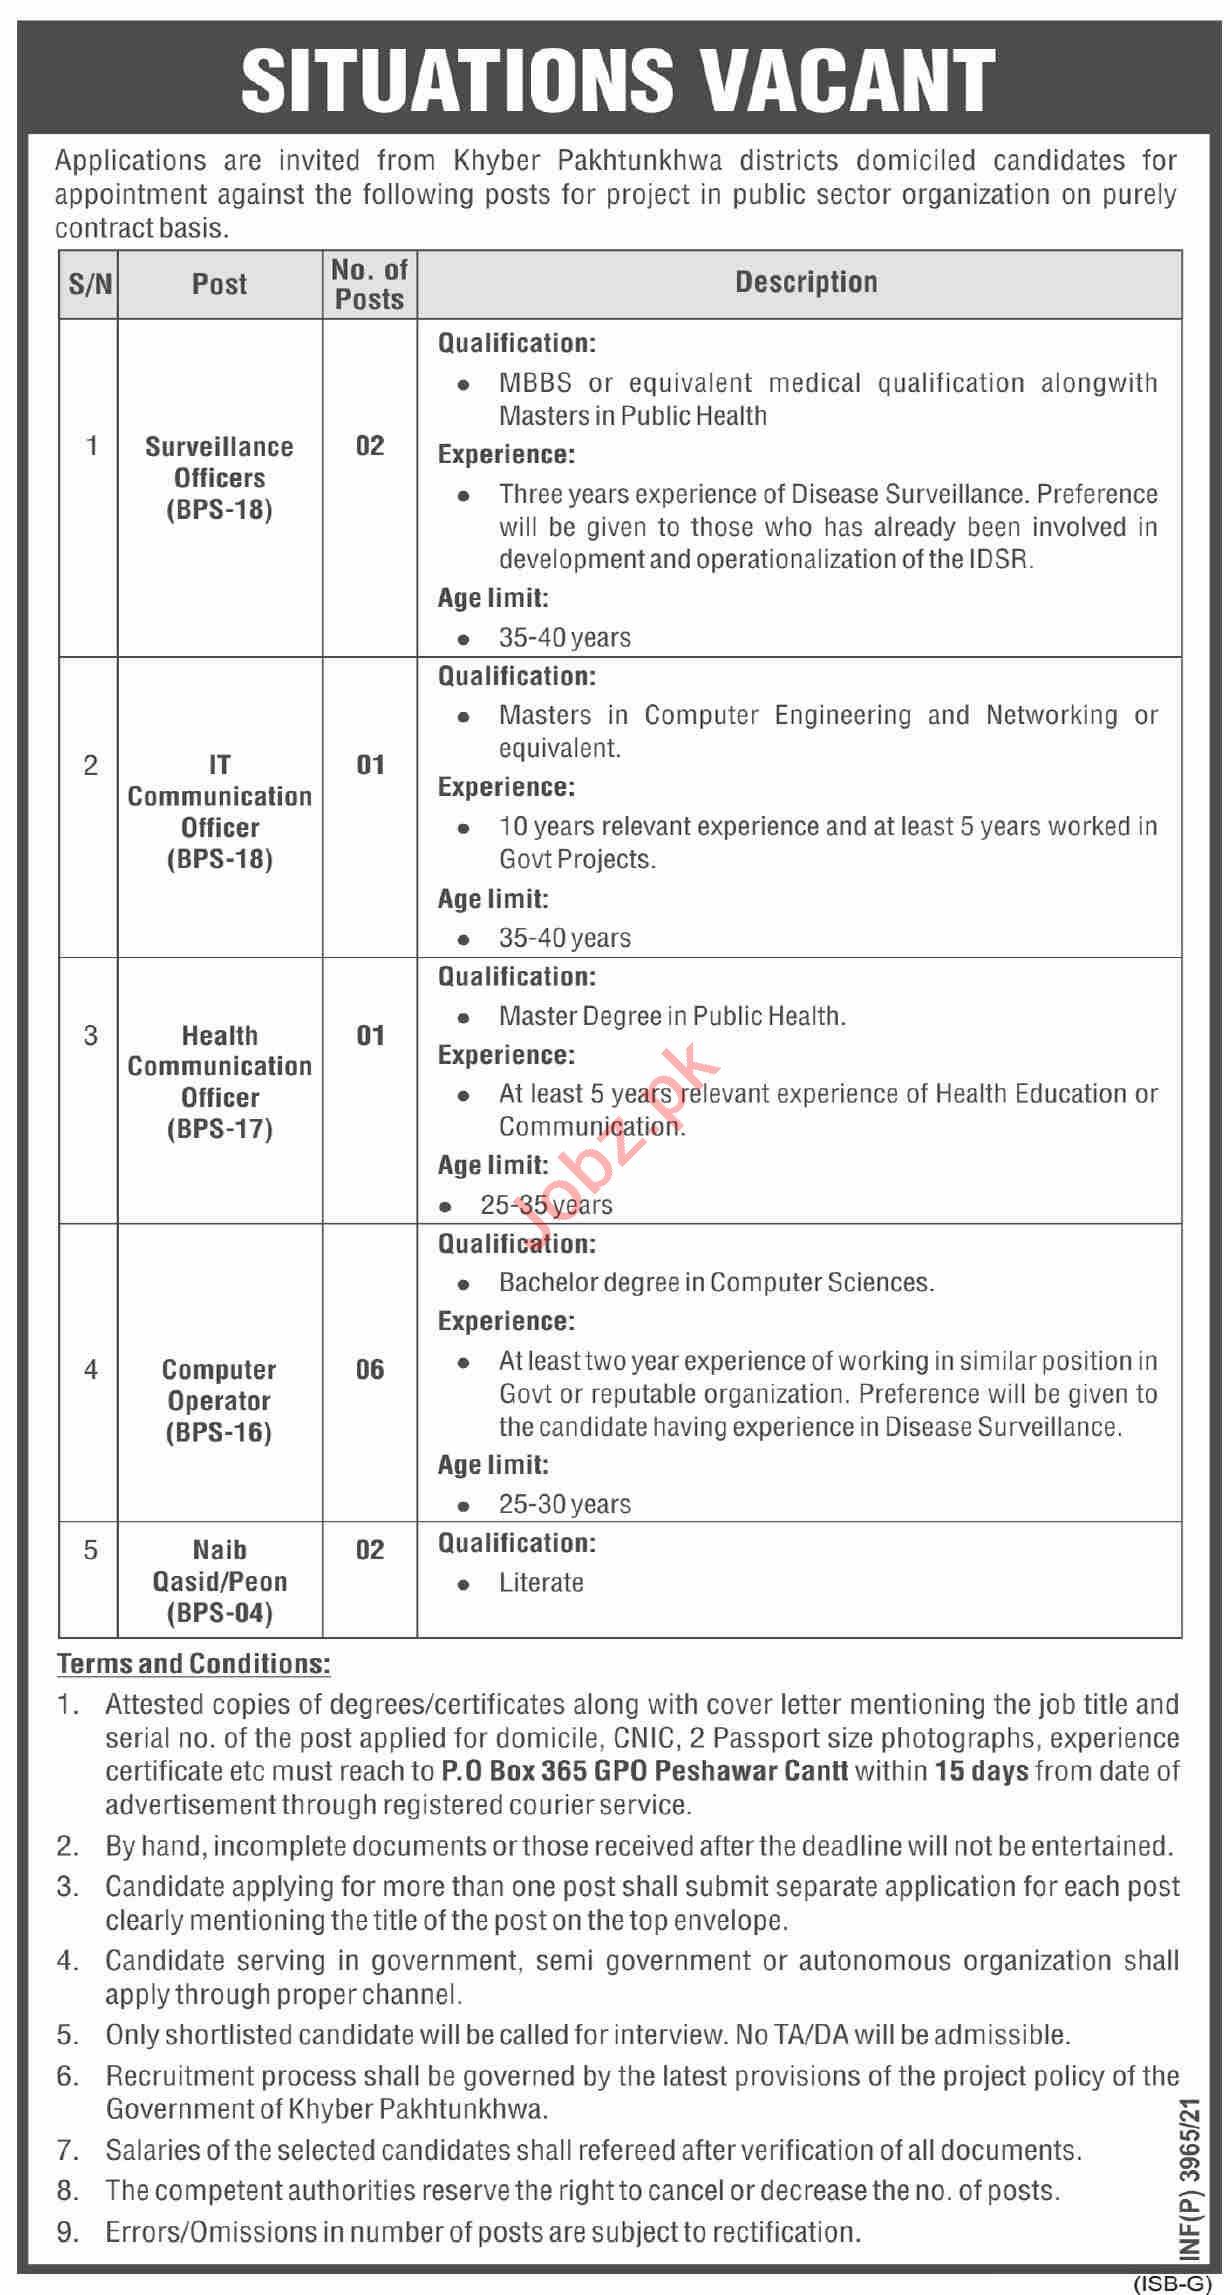 P O Box No 365 GPO Peshawar Cantt Jobs 2021